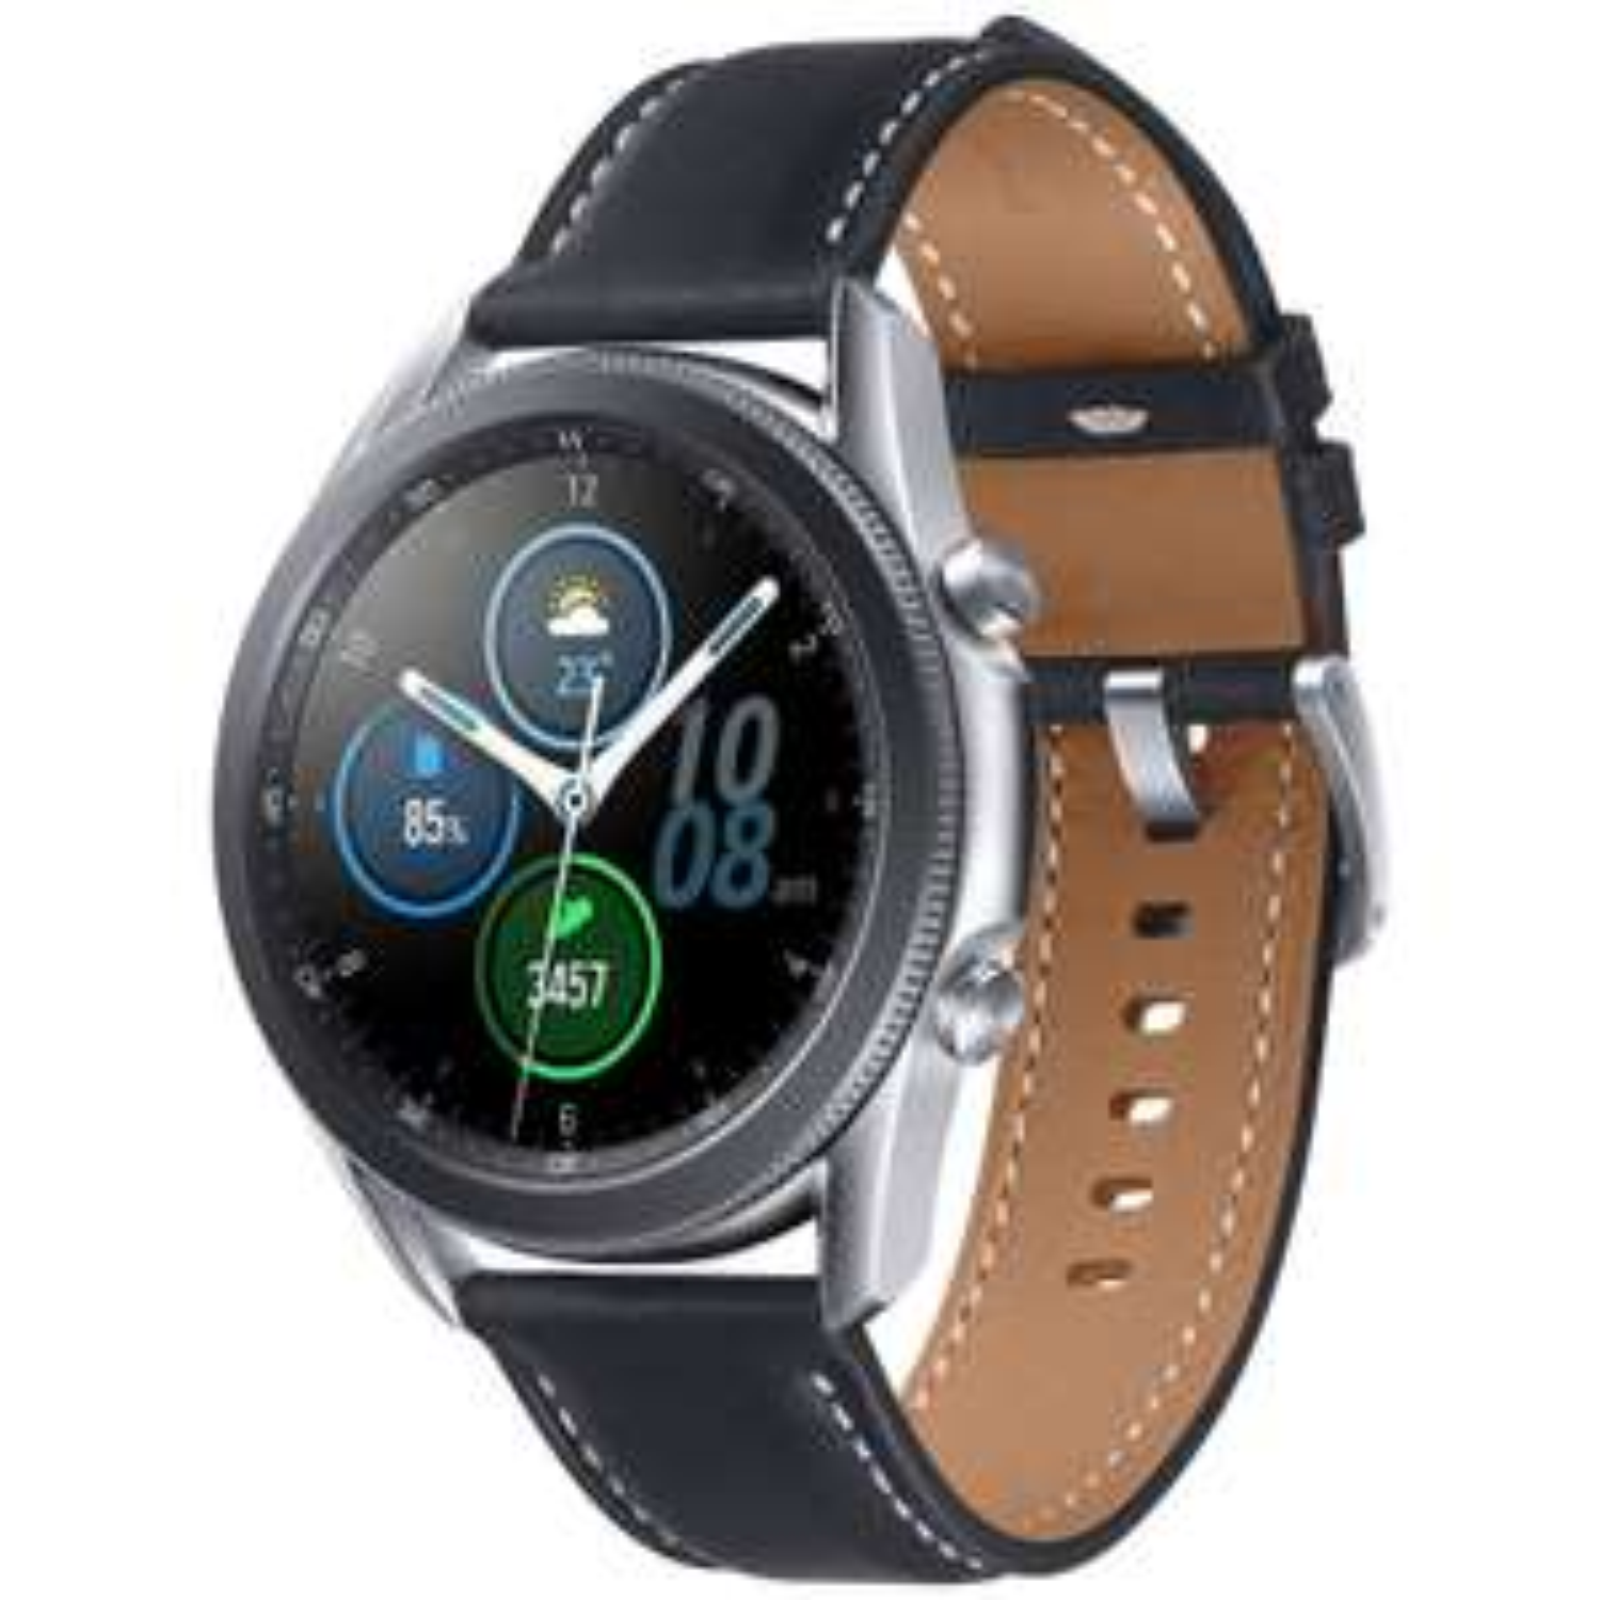 Montre connectée Samsung Galaxy Watch 3 - Noir, Boitier 45 mm (Vendeur tiers)